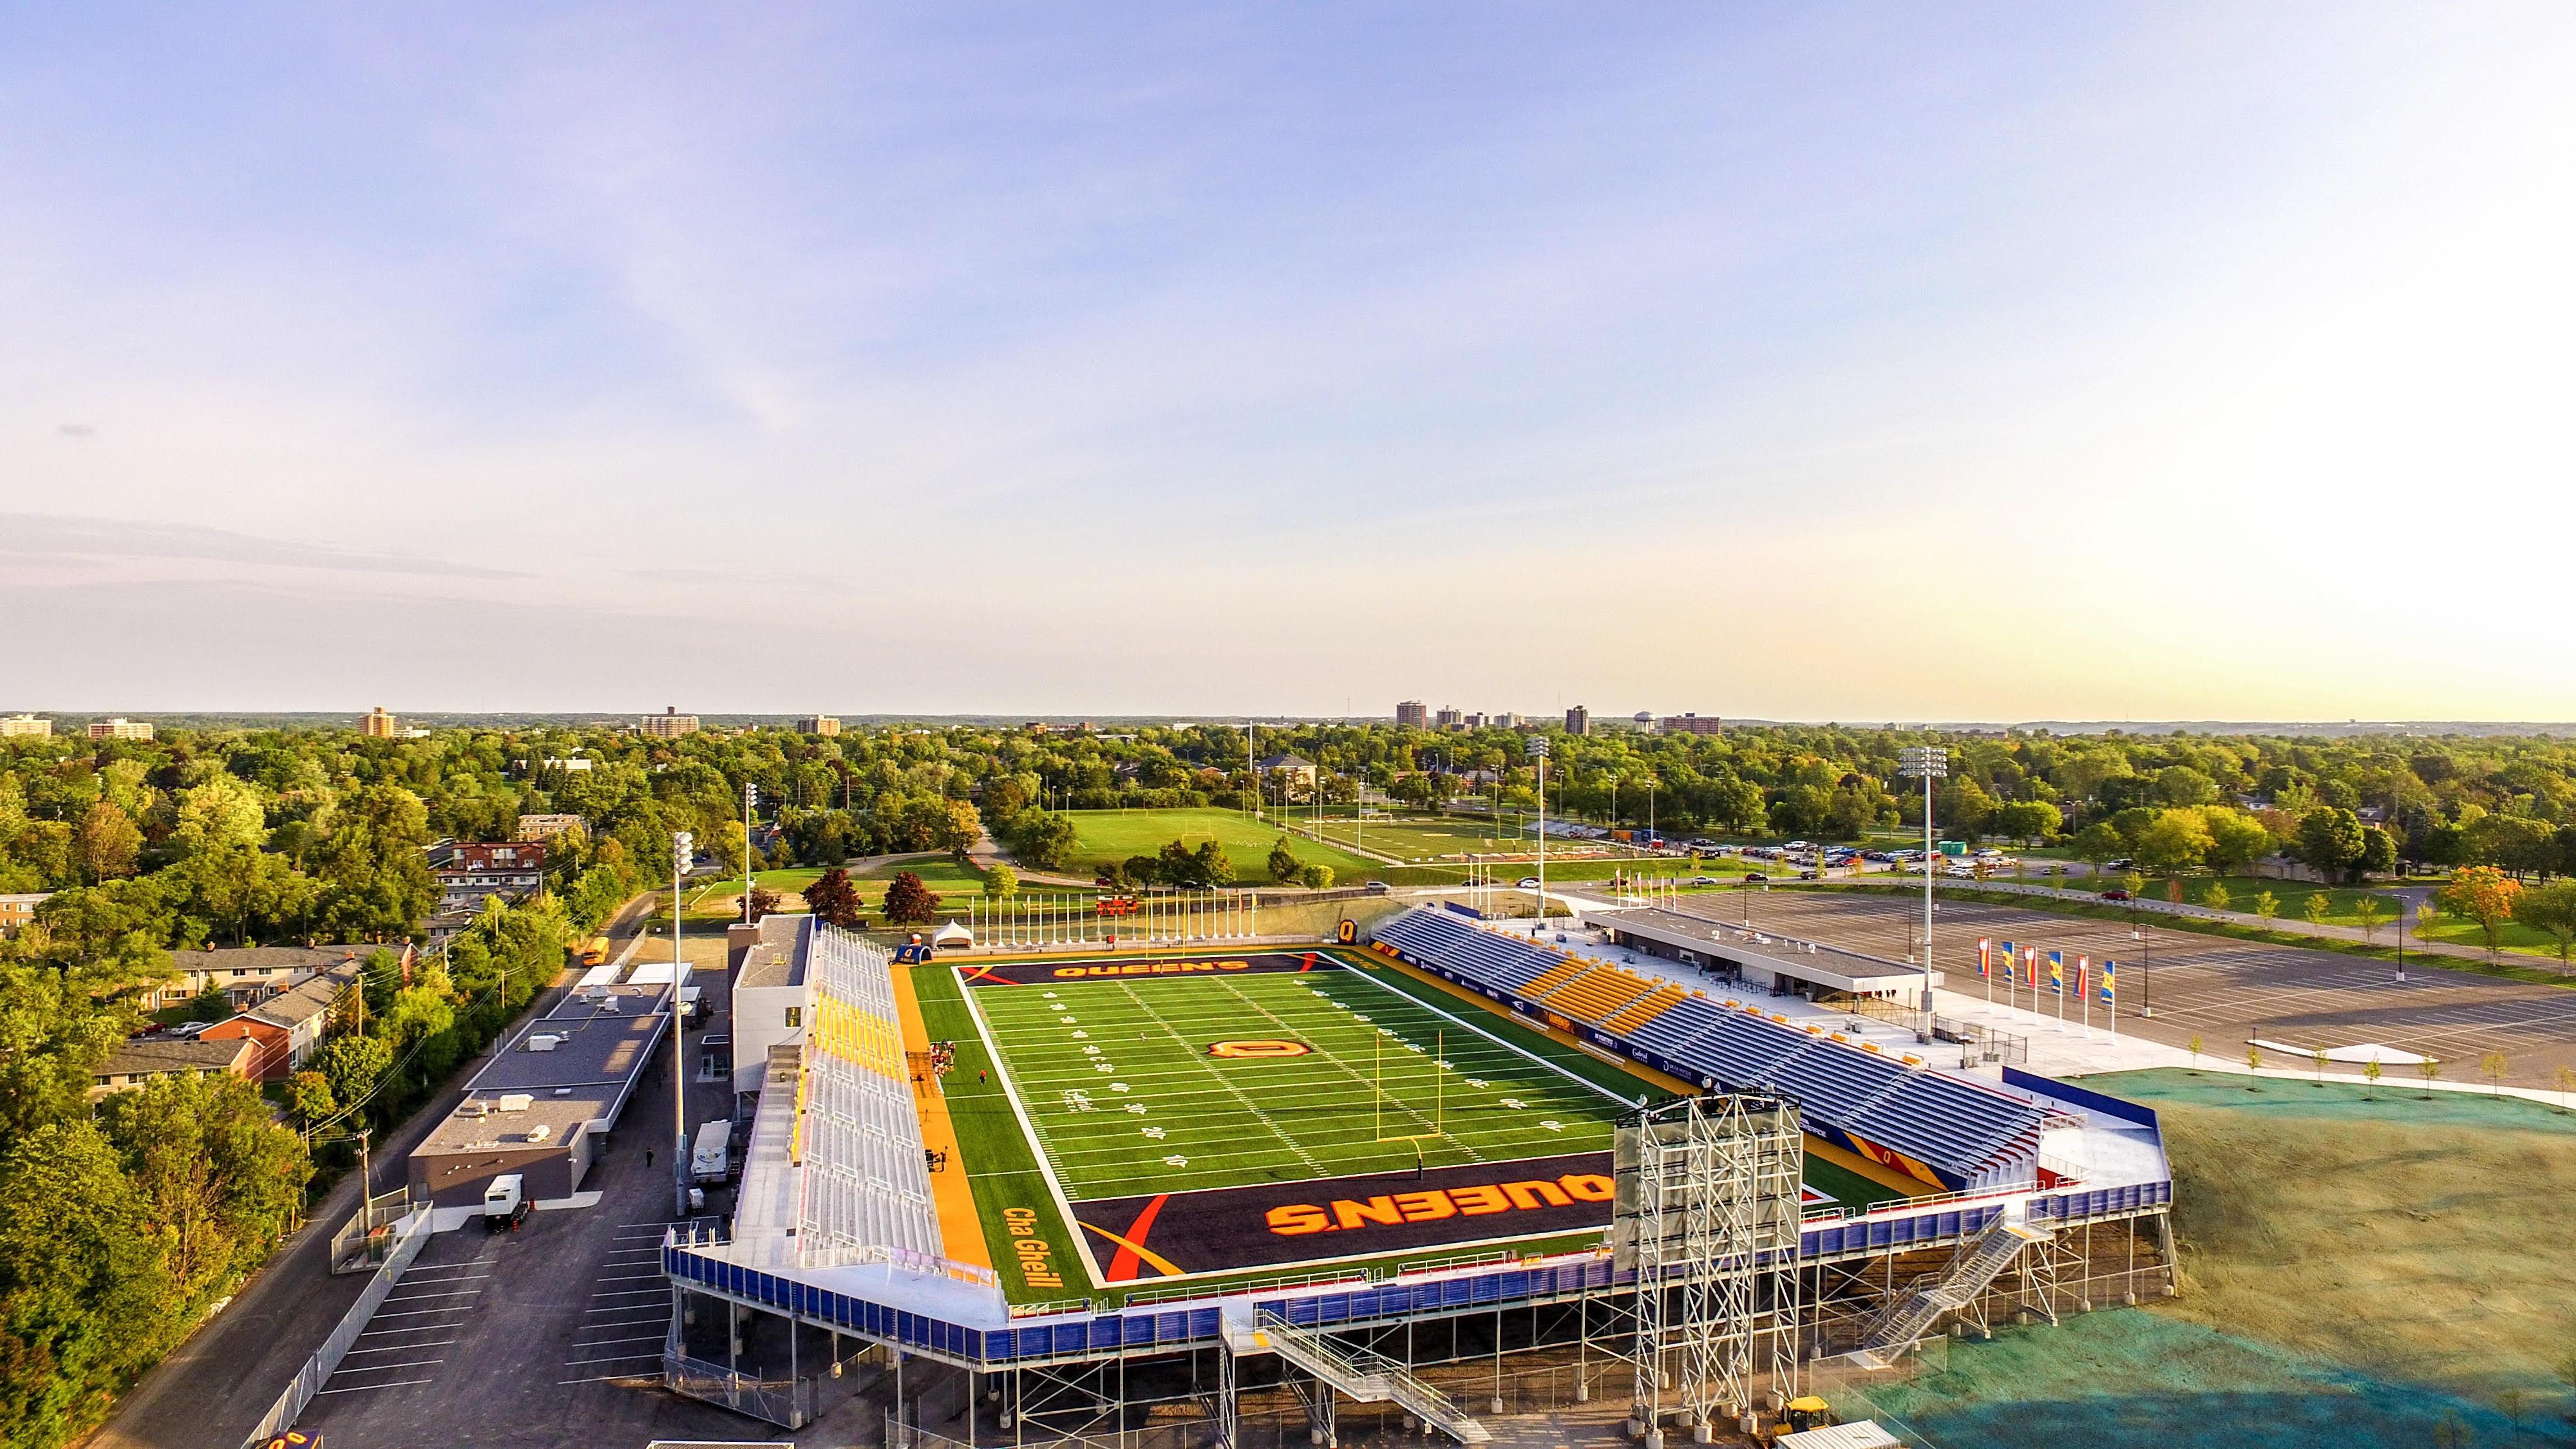 richardson-stadium-queen's-university-dr